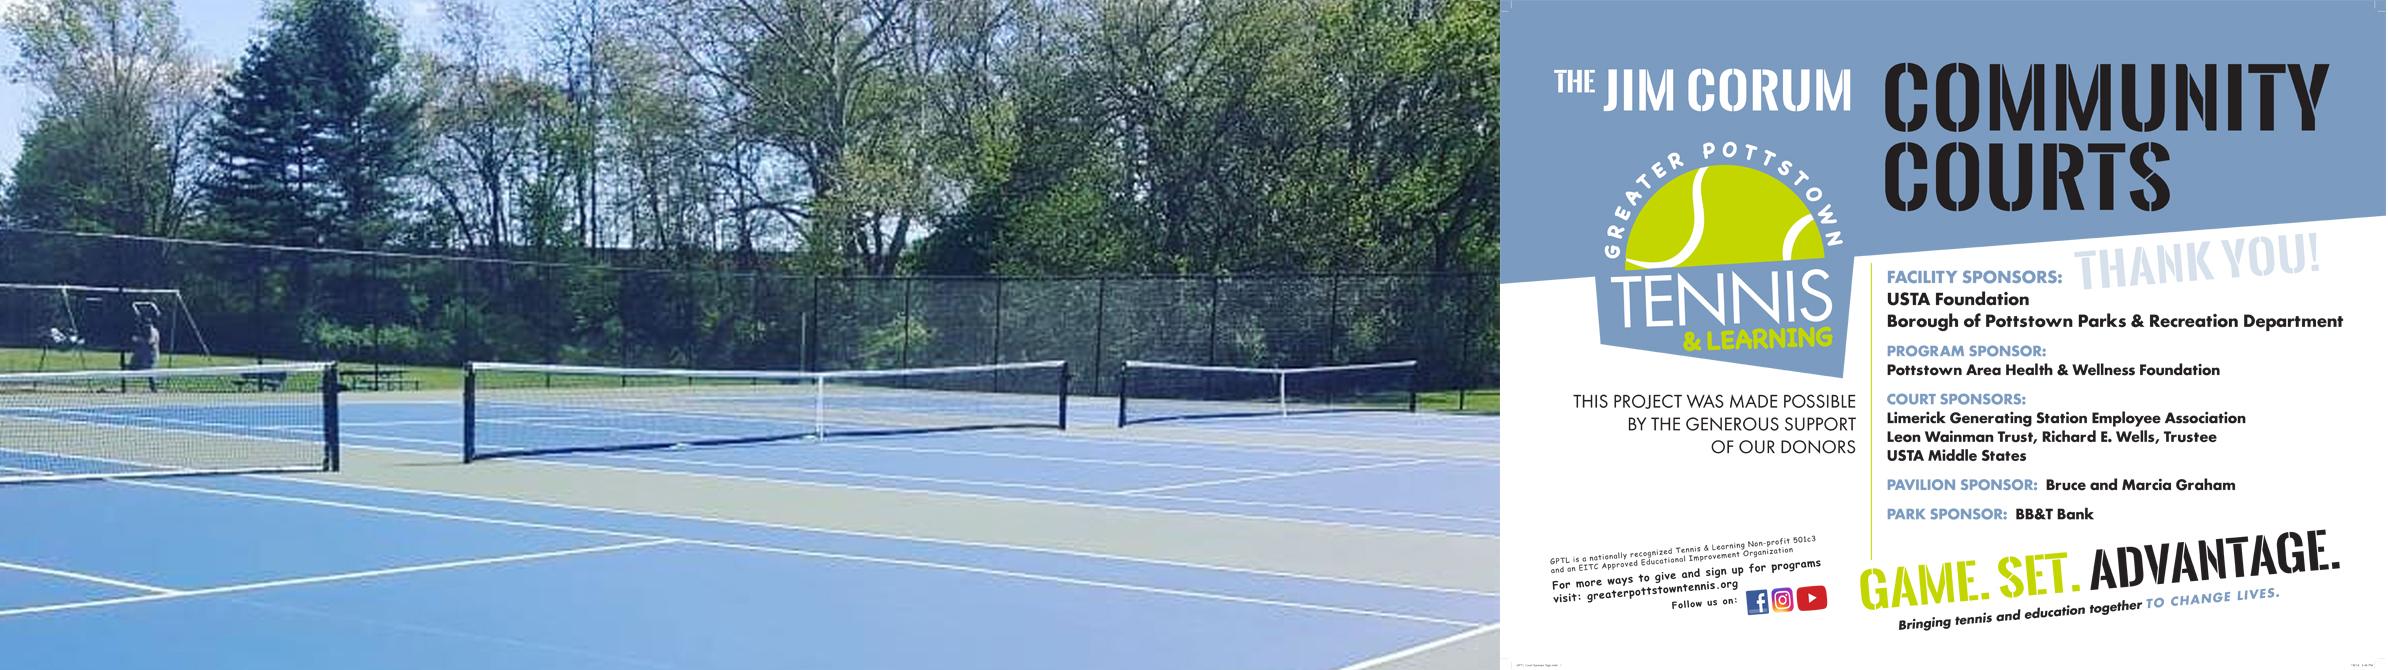 New Maple St. Park Tennis Courts